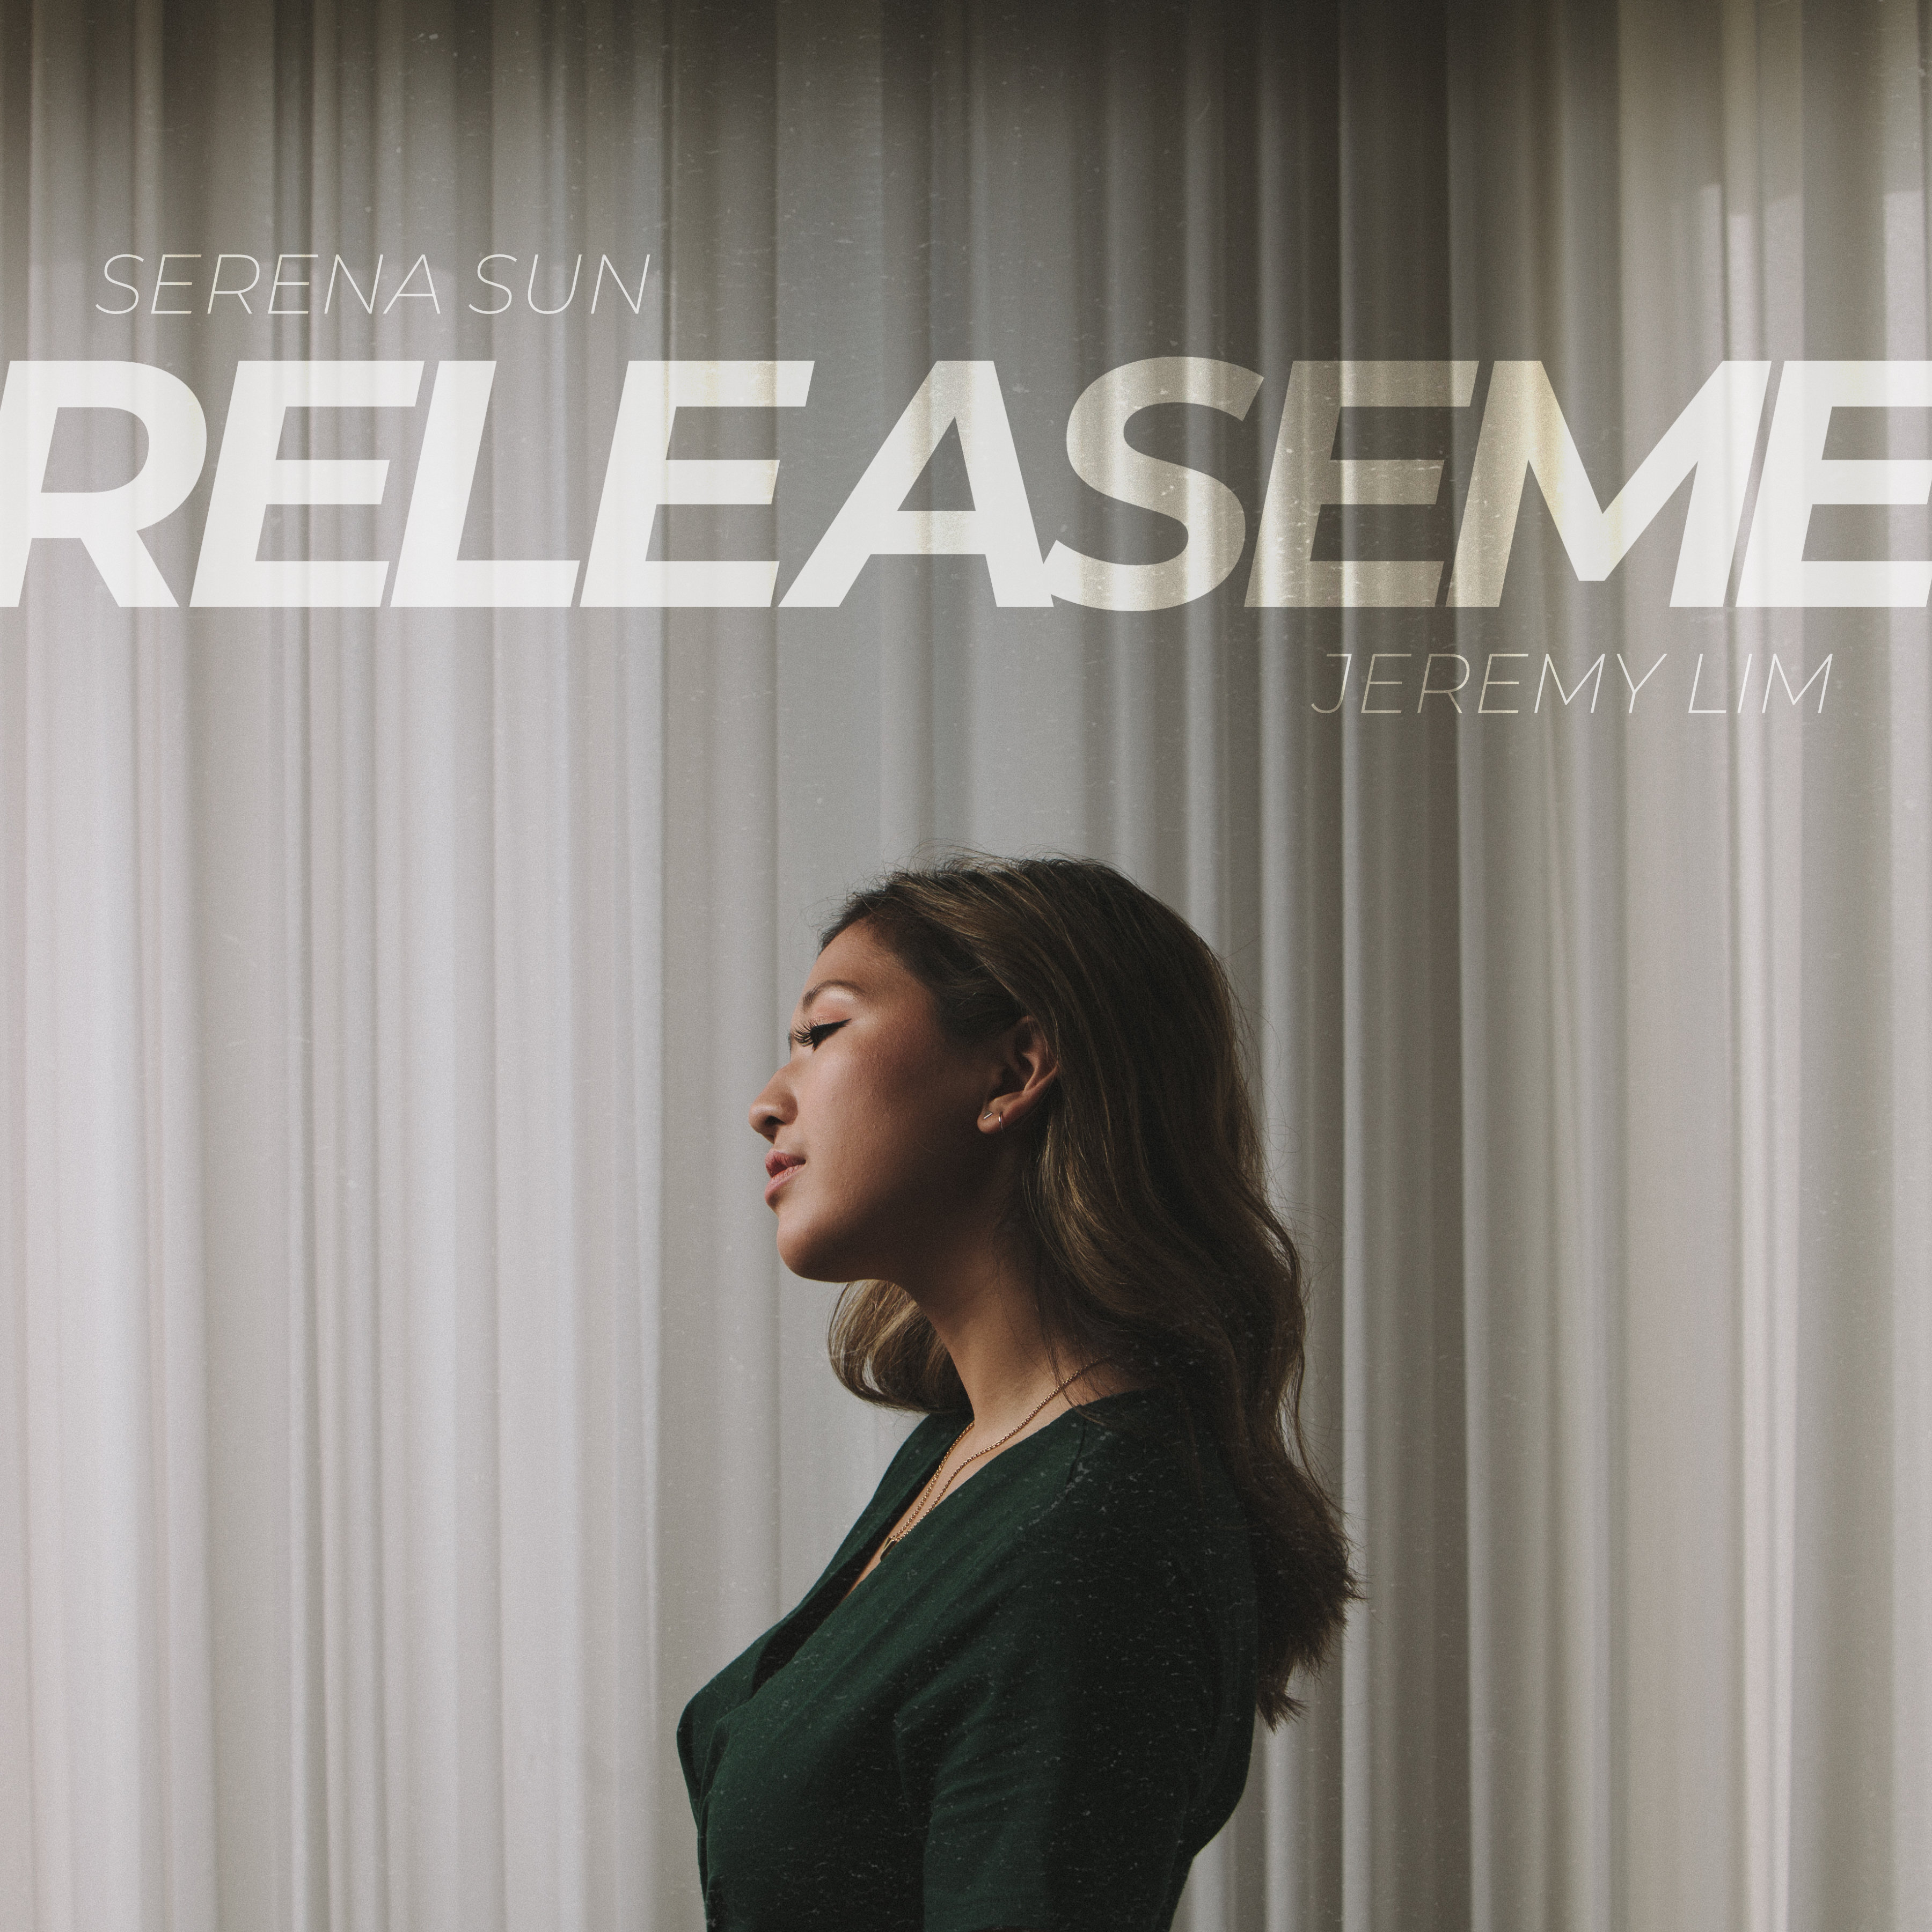 Release Me - Serena Sun, Jeremy Lim